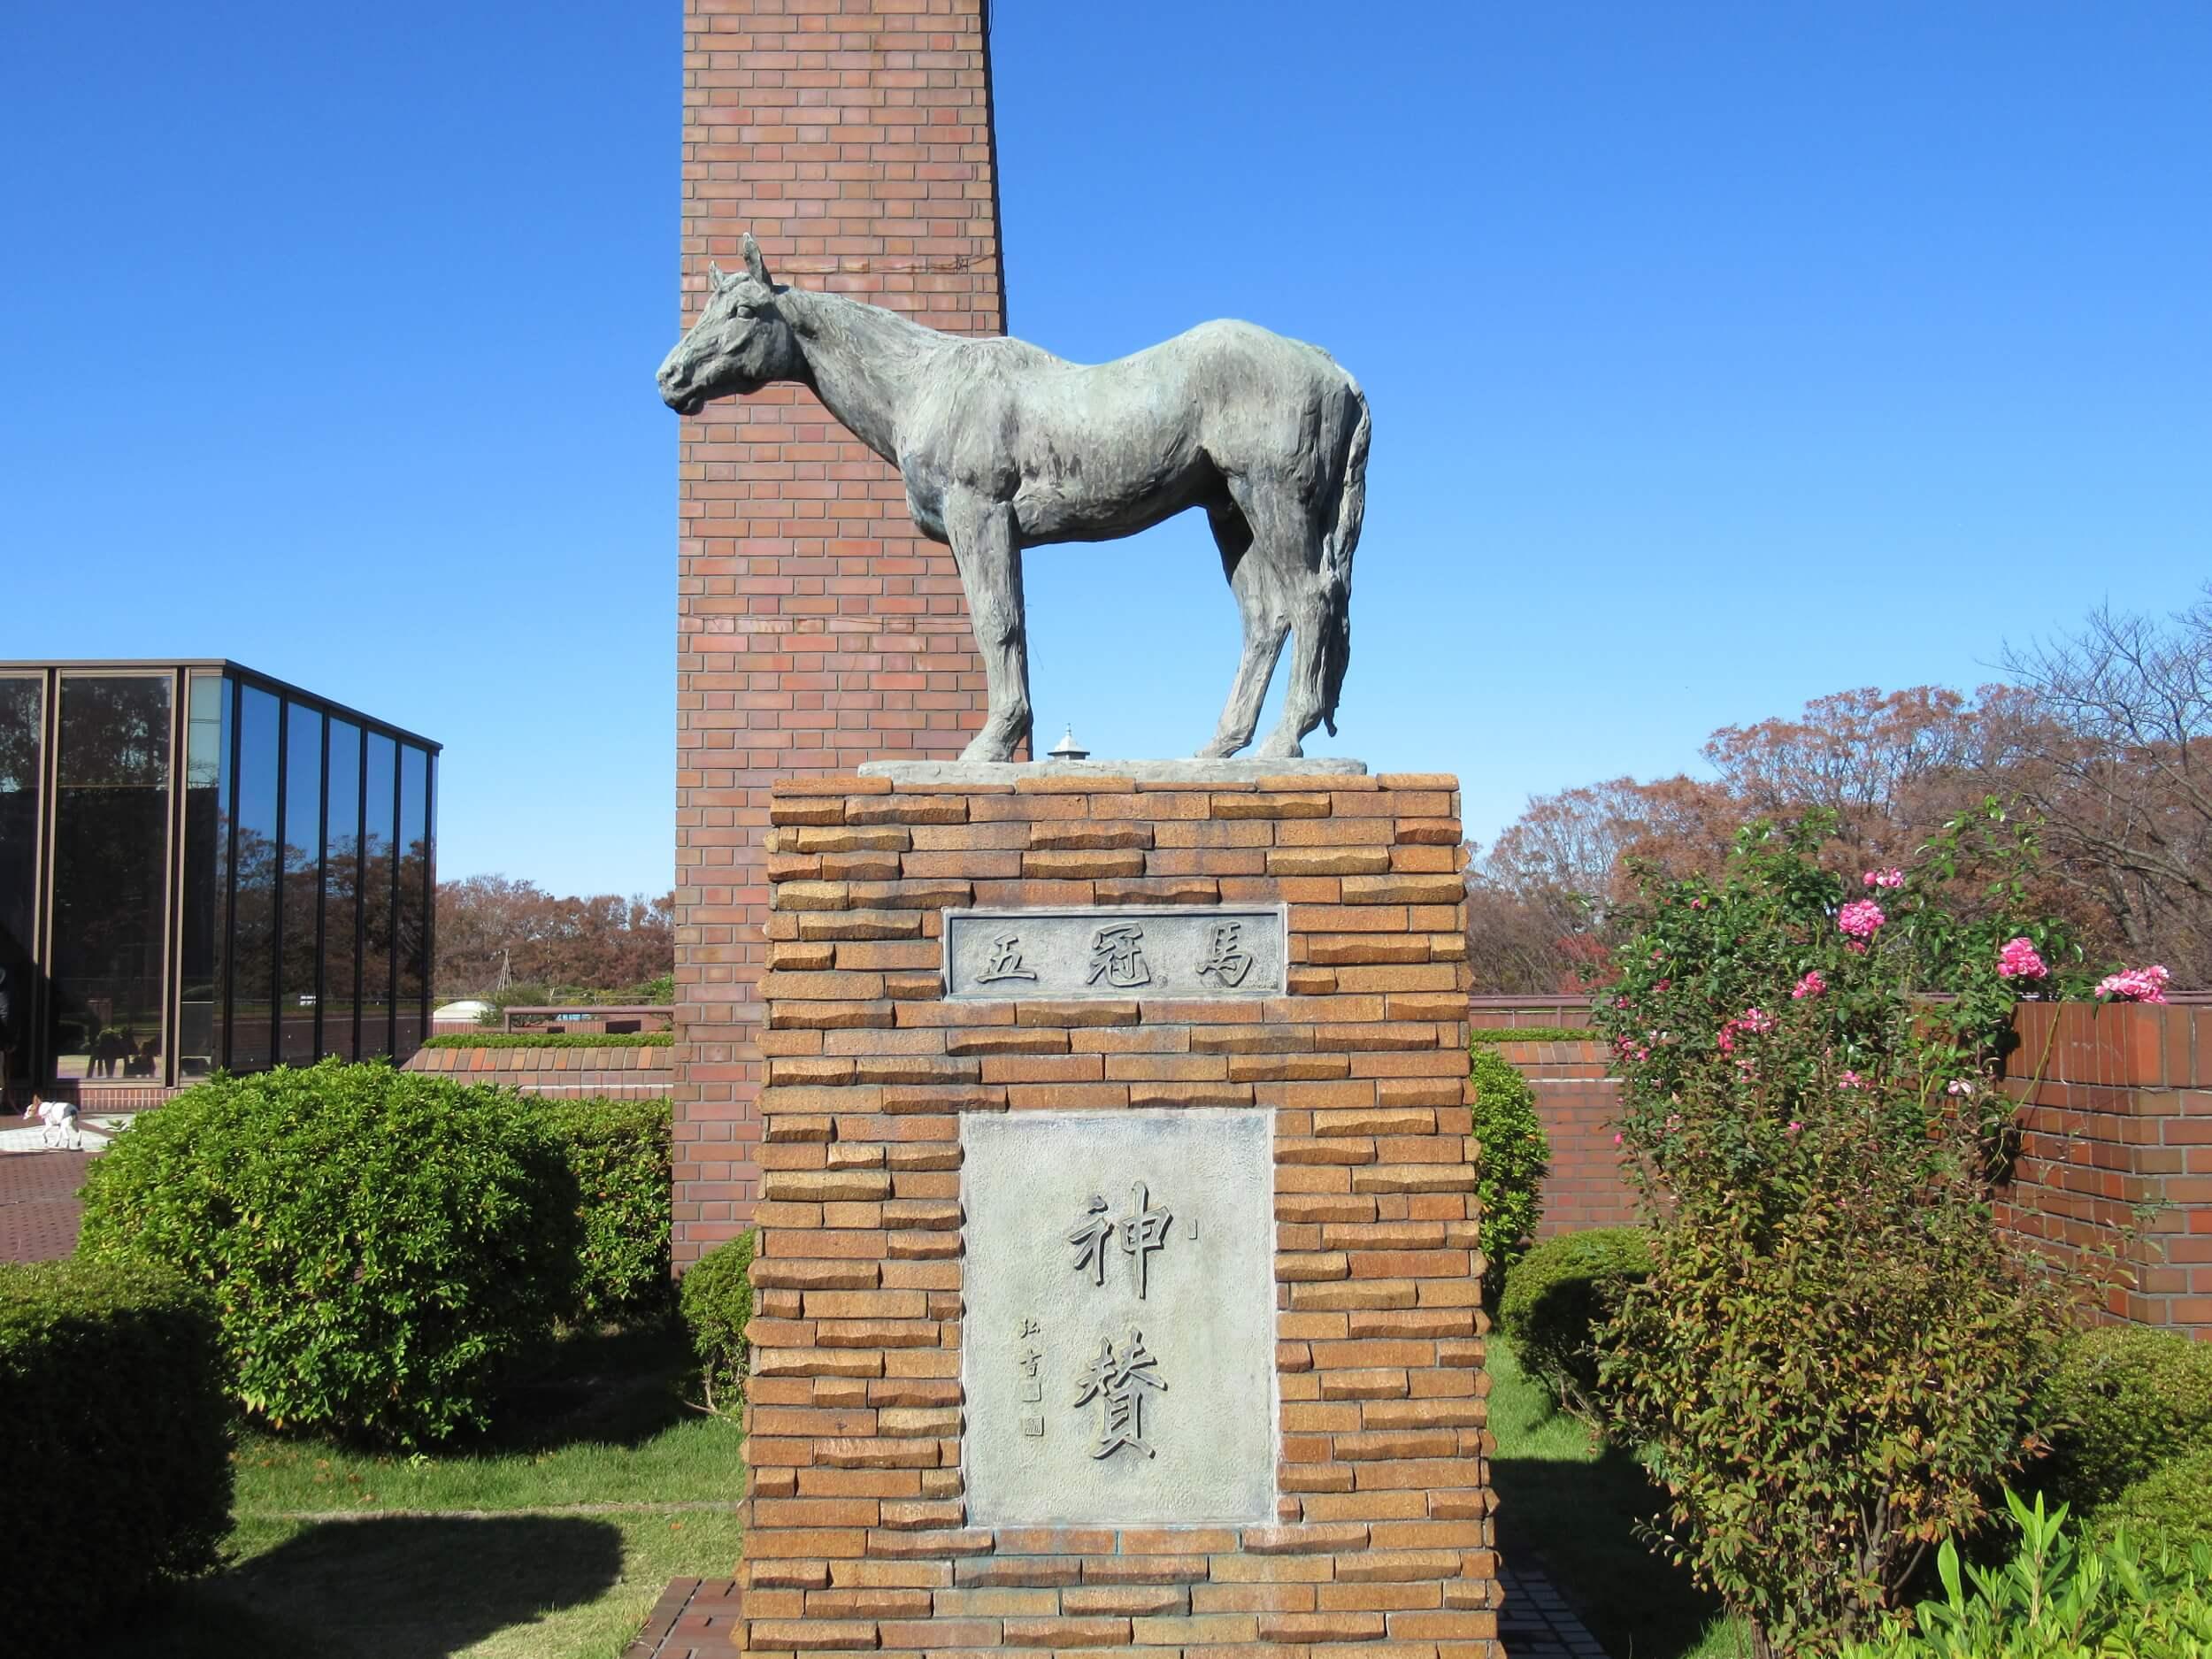 Horse Museum・Historically famous racehorse・shinzan